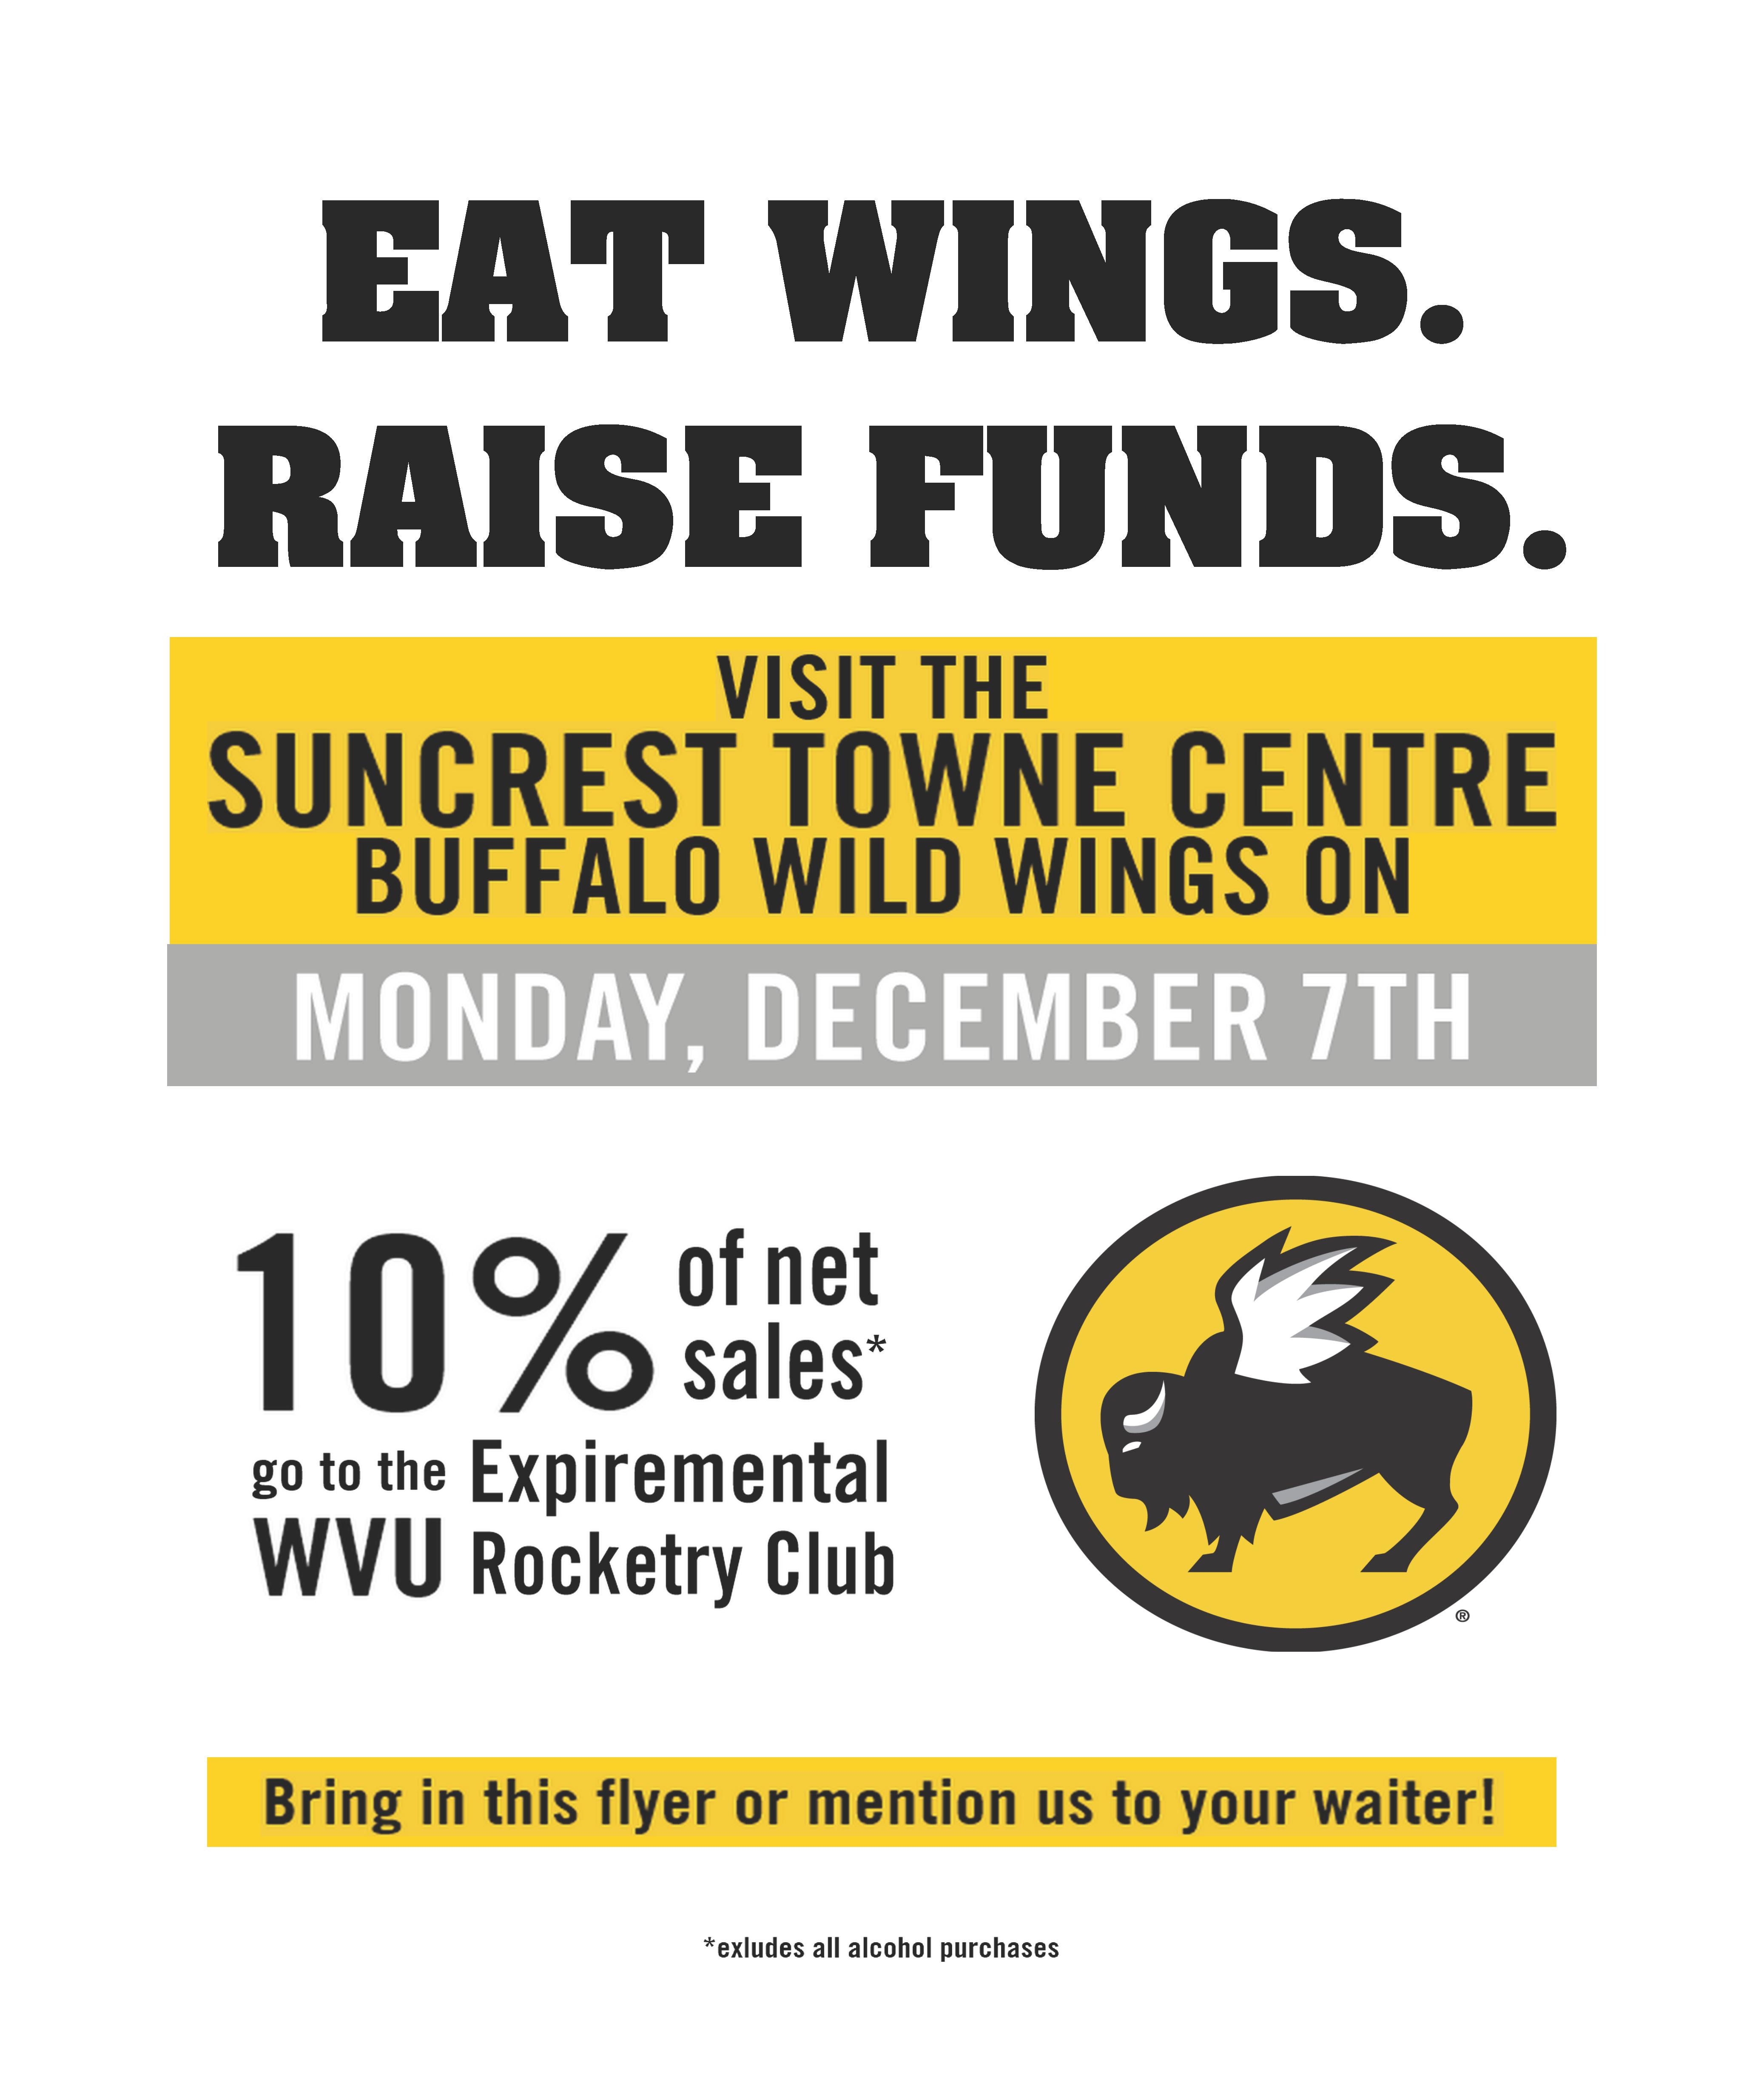 buffalo wild wings fundraiser flyer - Heart.impulsar.co